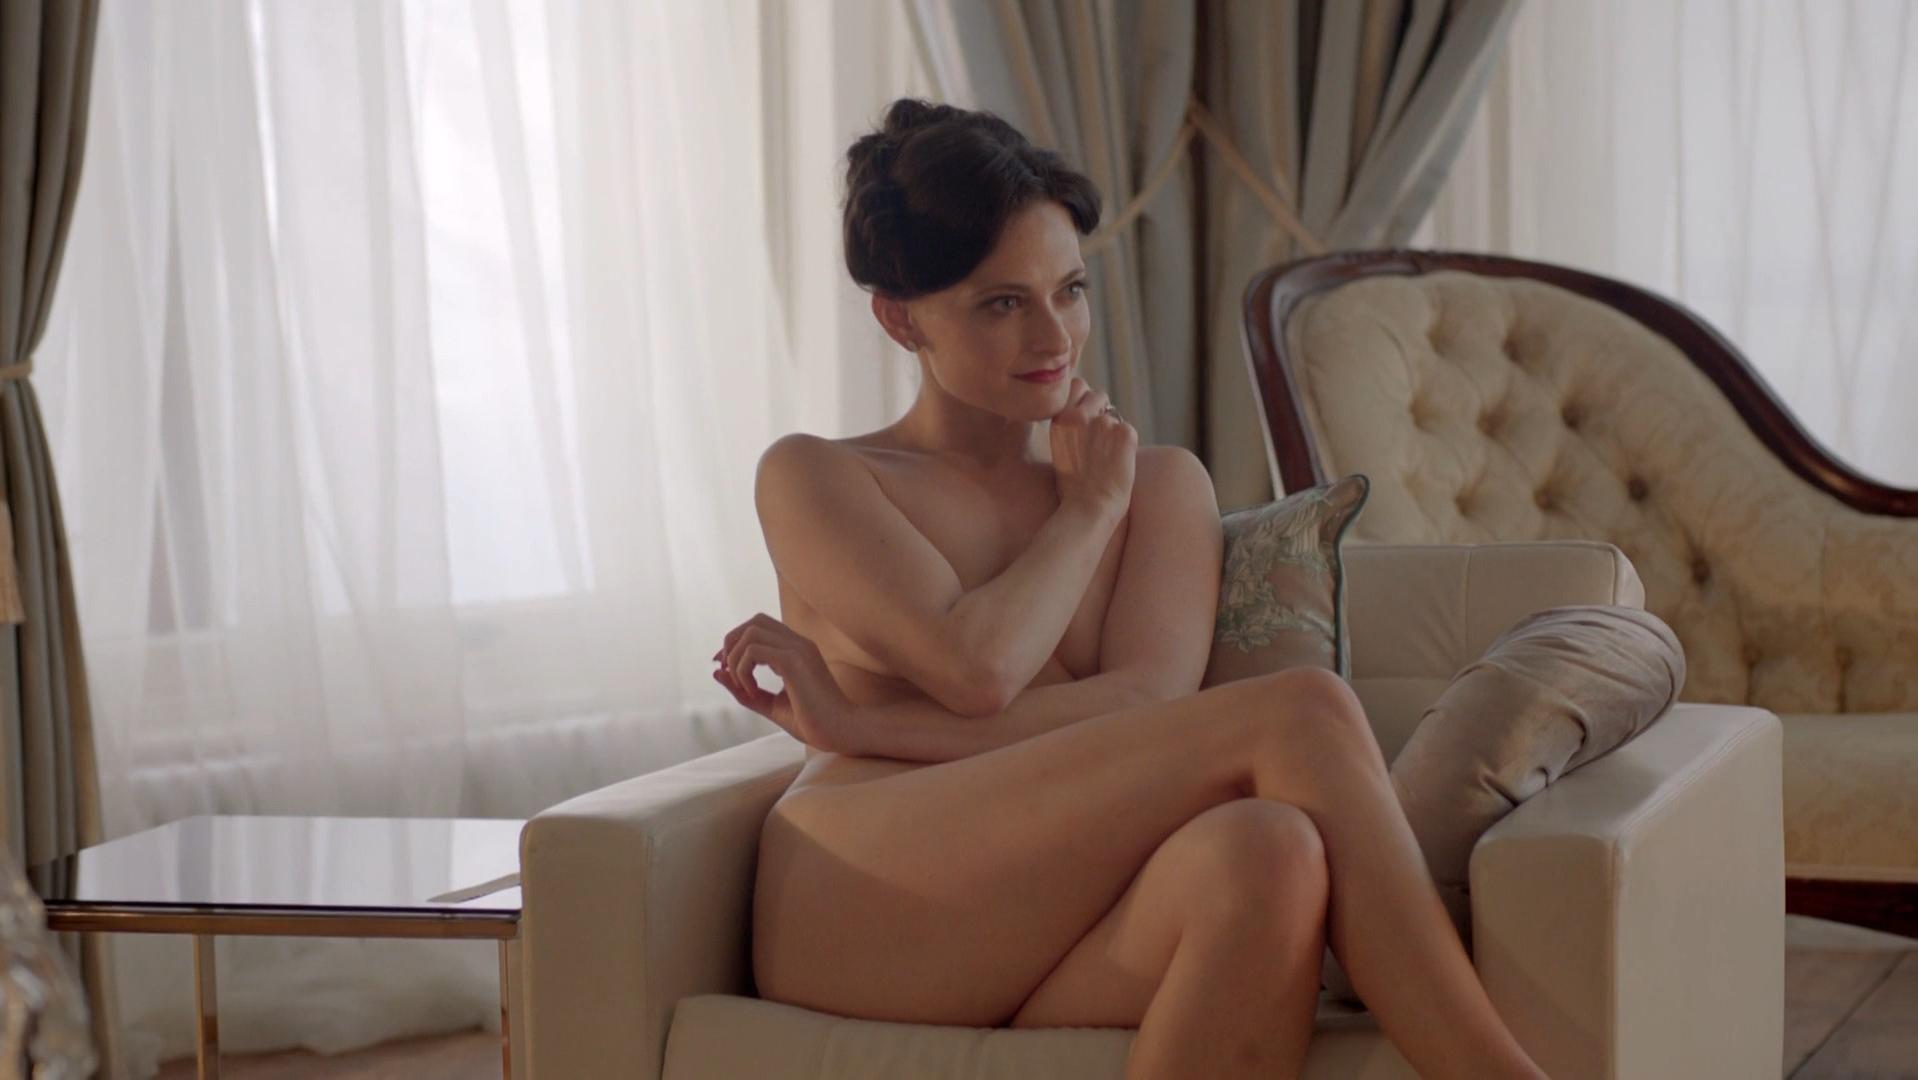 Lara Pulver nude - Sherlock s02e01 (2012)